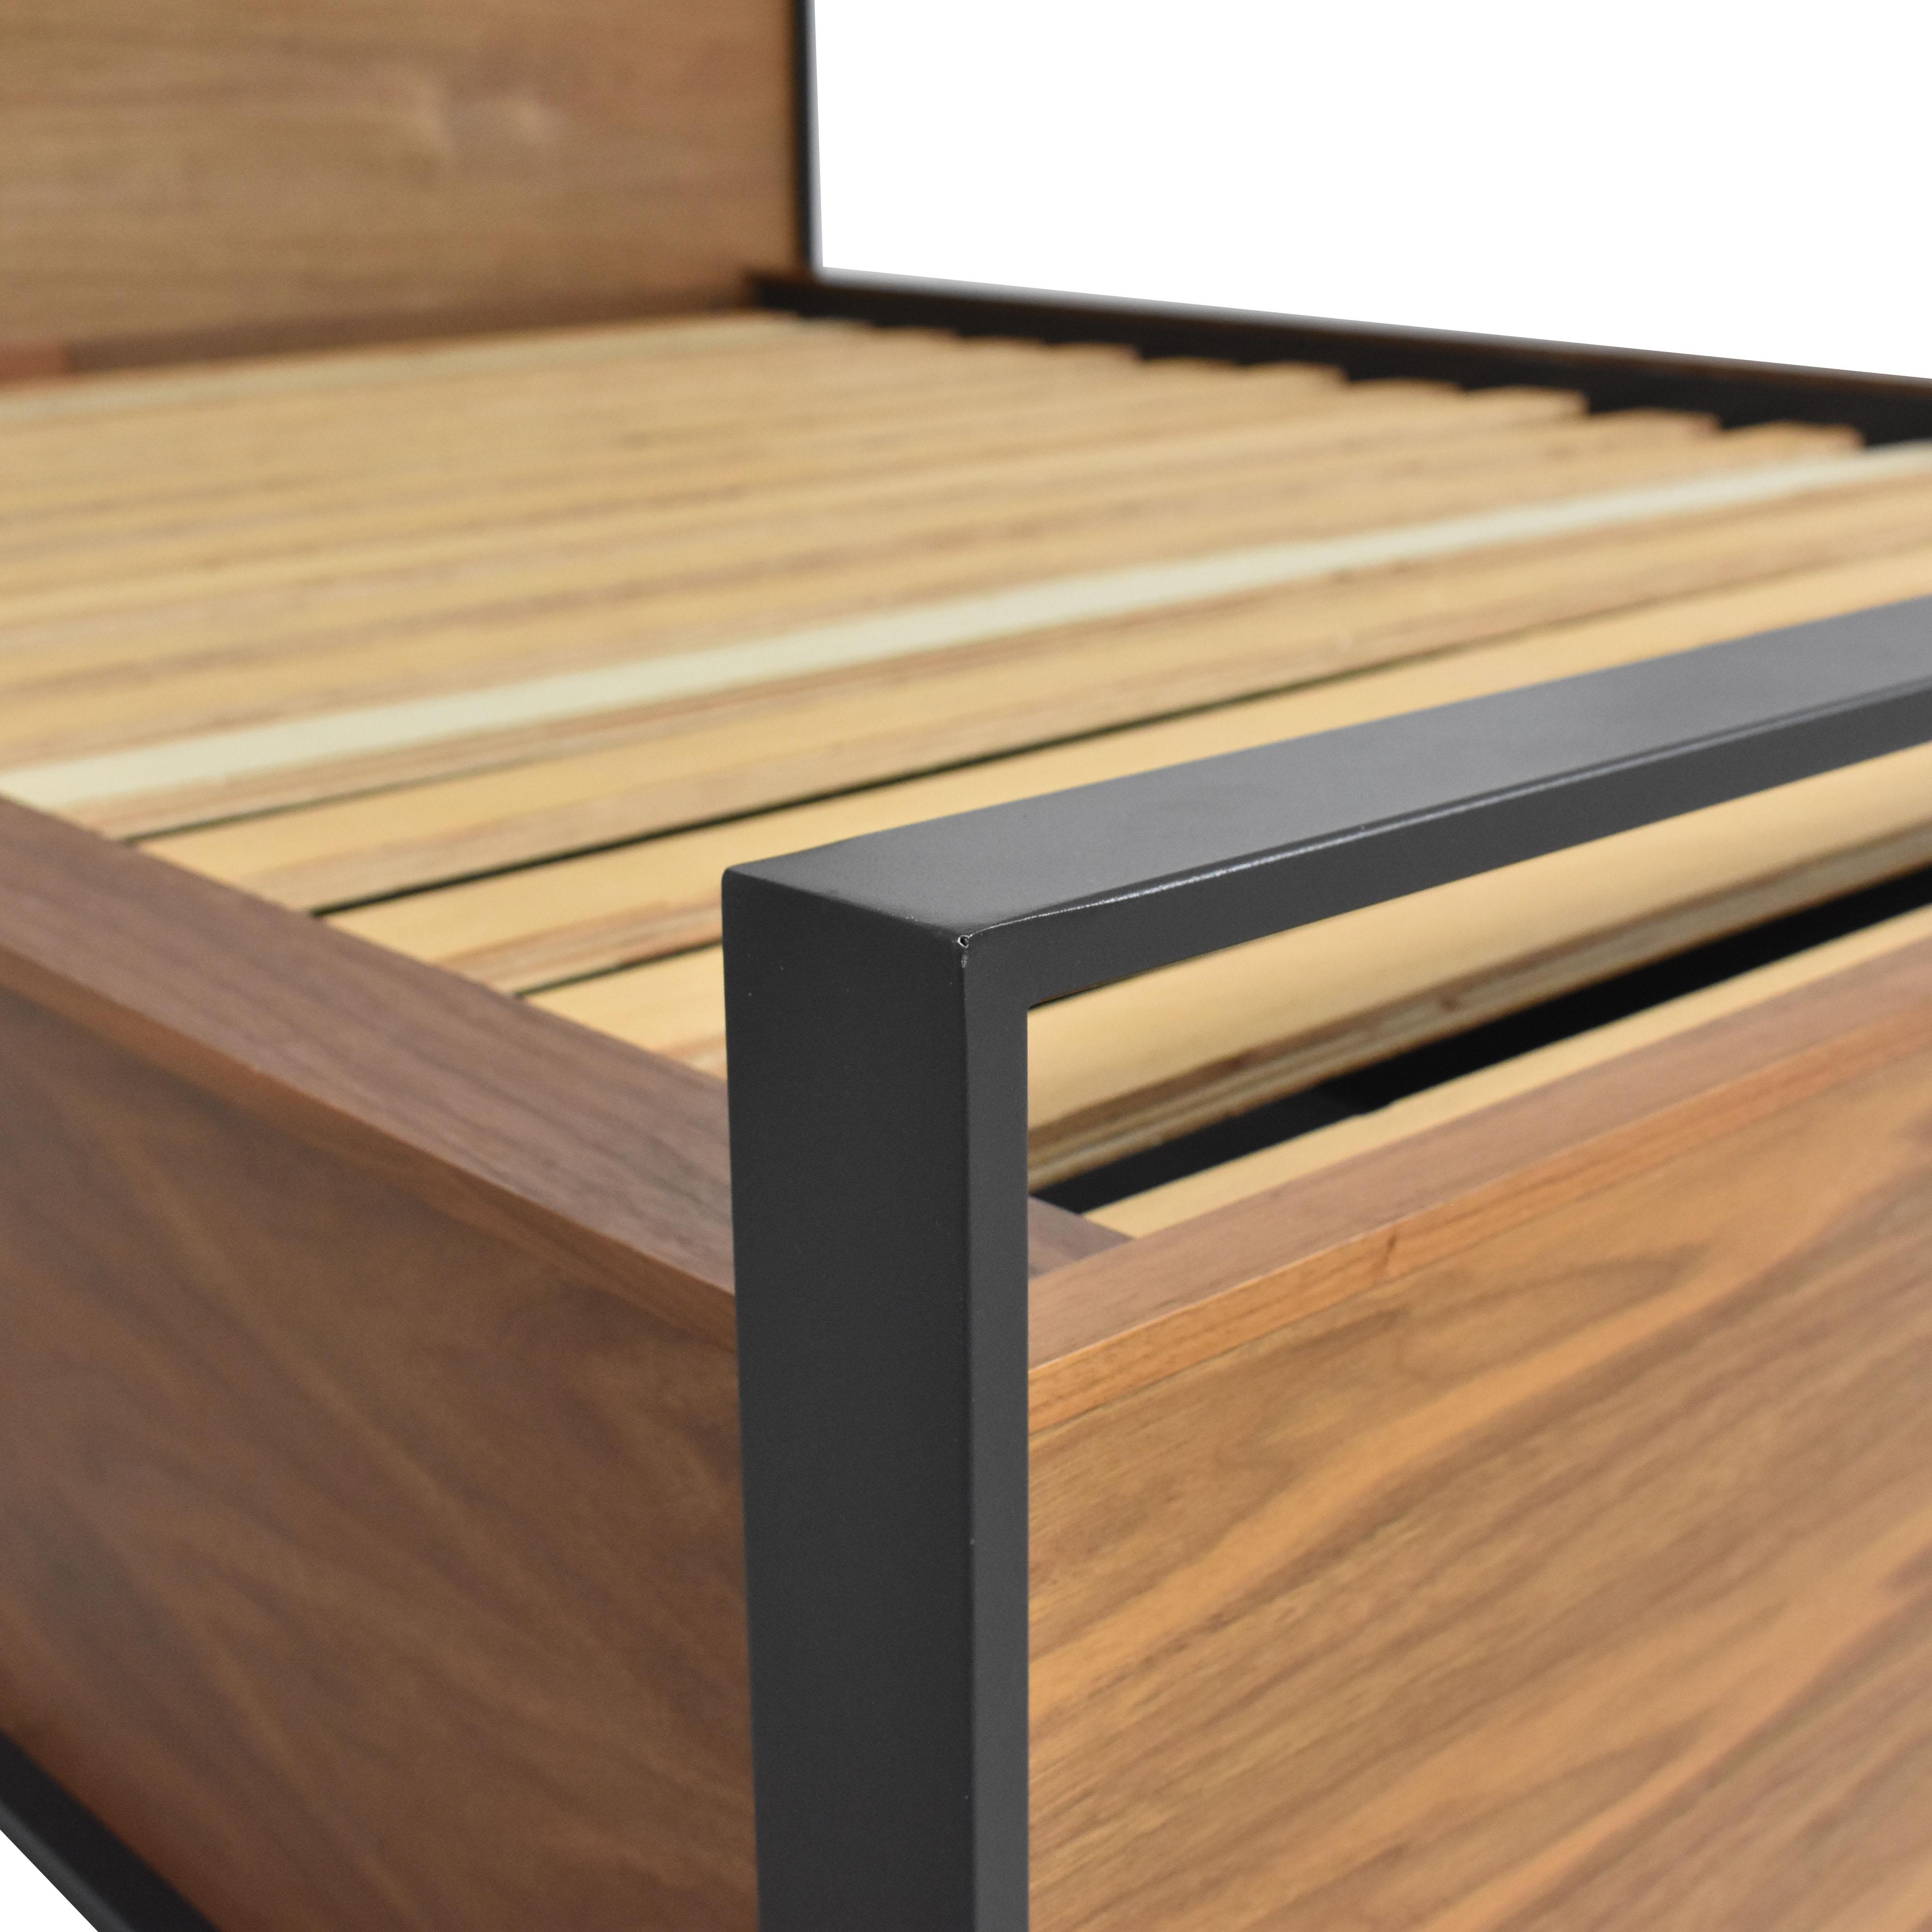 Crate & Barrel Crate & Barrel Queen Storage Bed Bed Frames